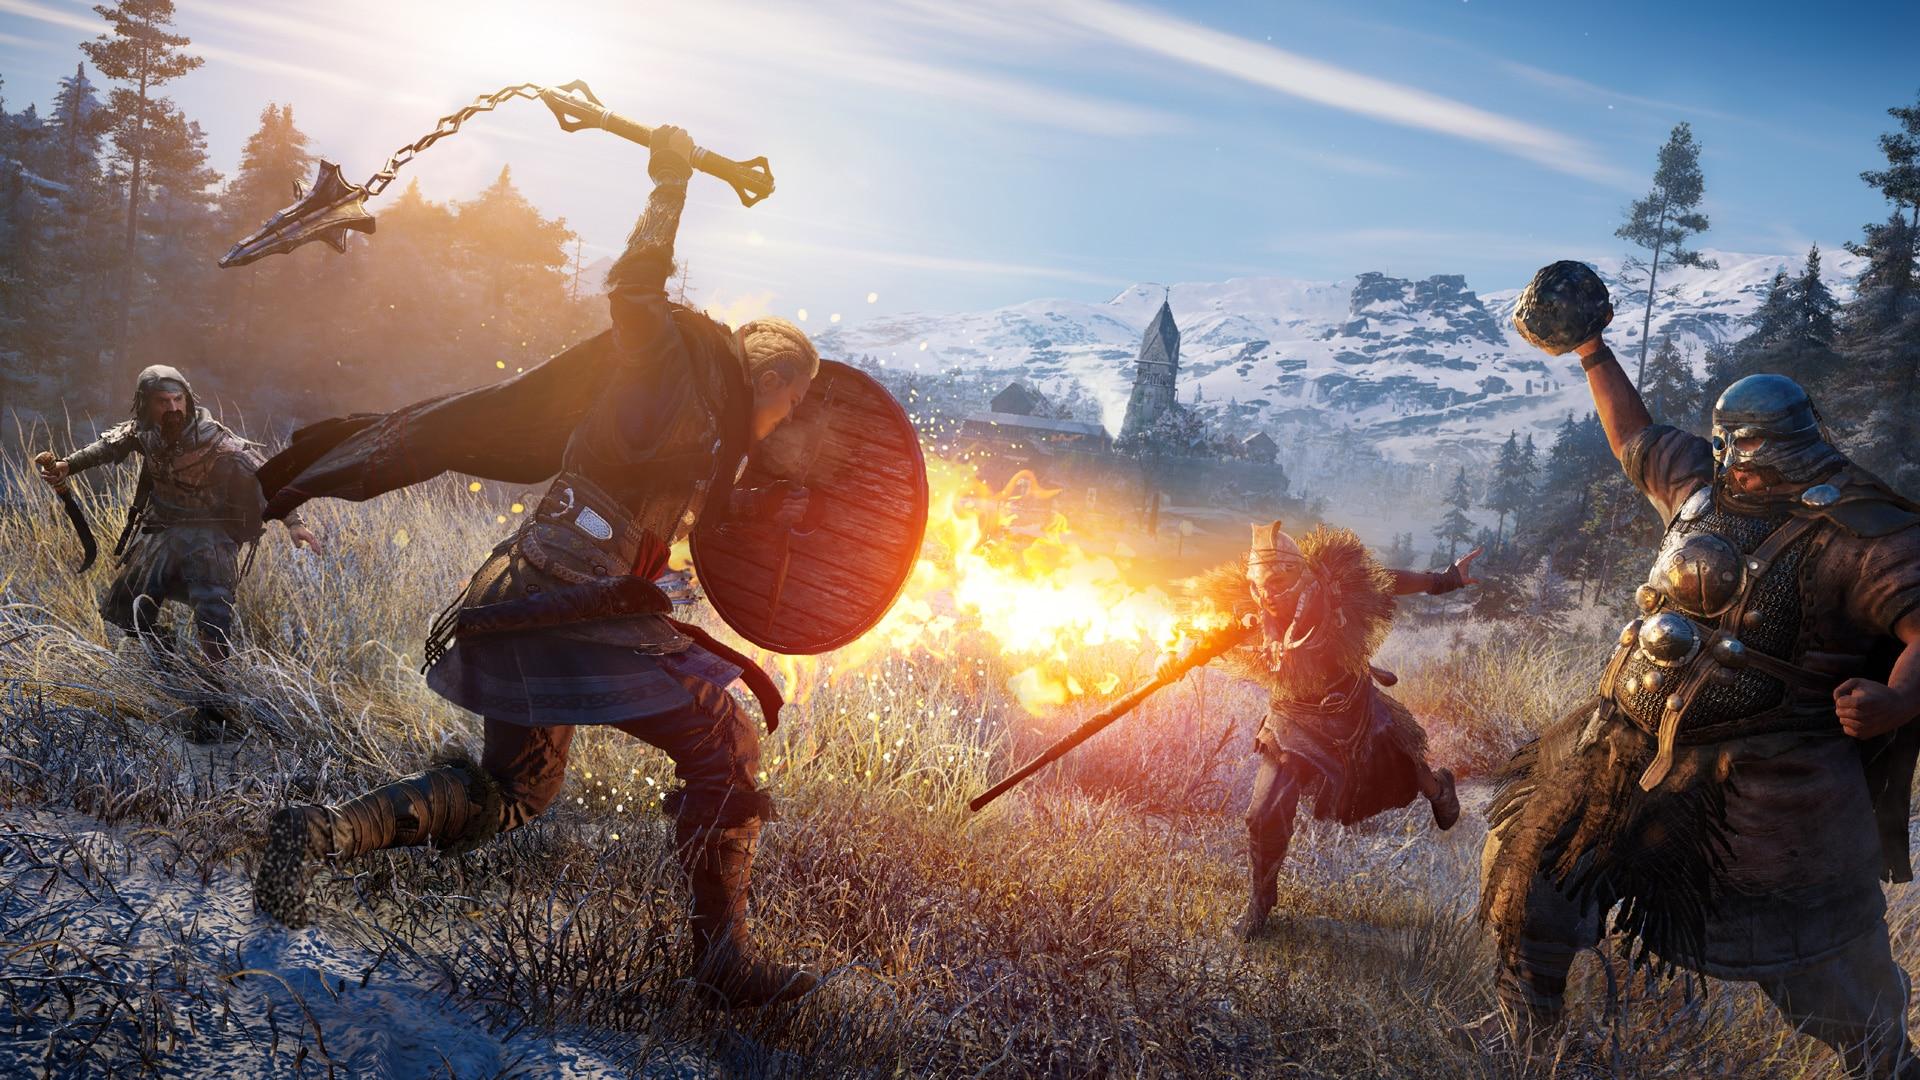 Assassin's Creed Valhalla – Assault Castles, Repair Broken Kingdoms, and Recruit a Cat Raider on November 17 - Image 2